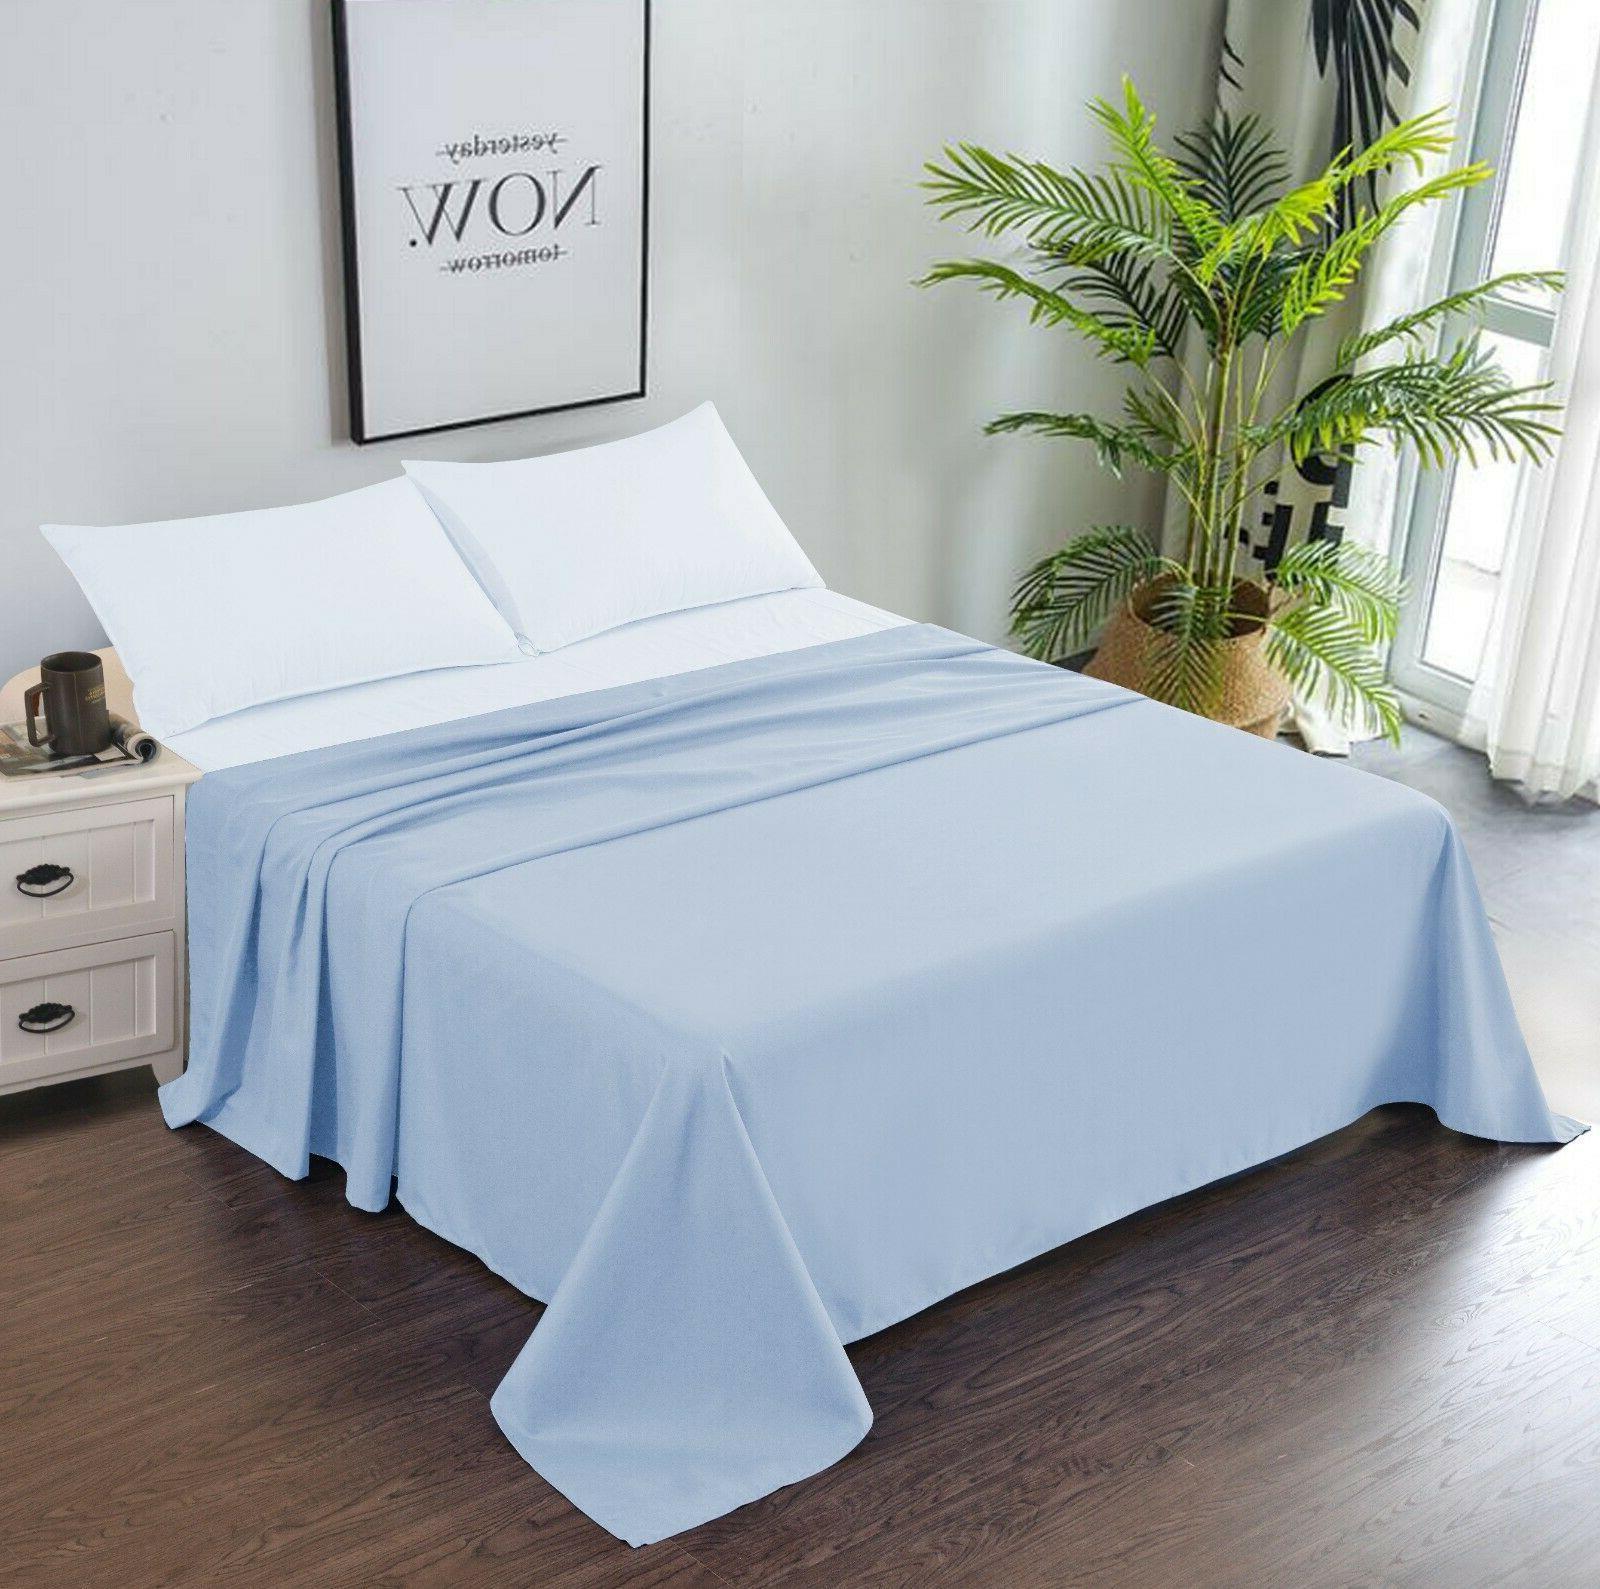 bedding microfiber flat sheet